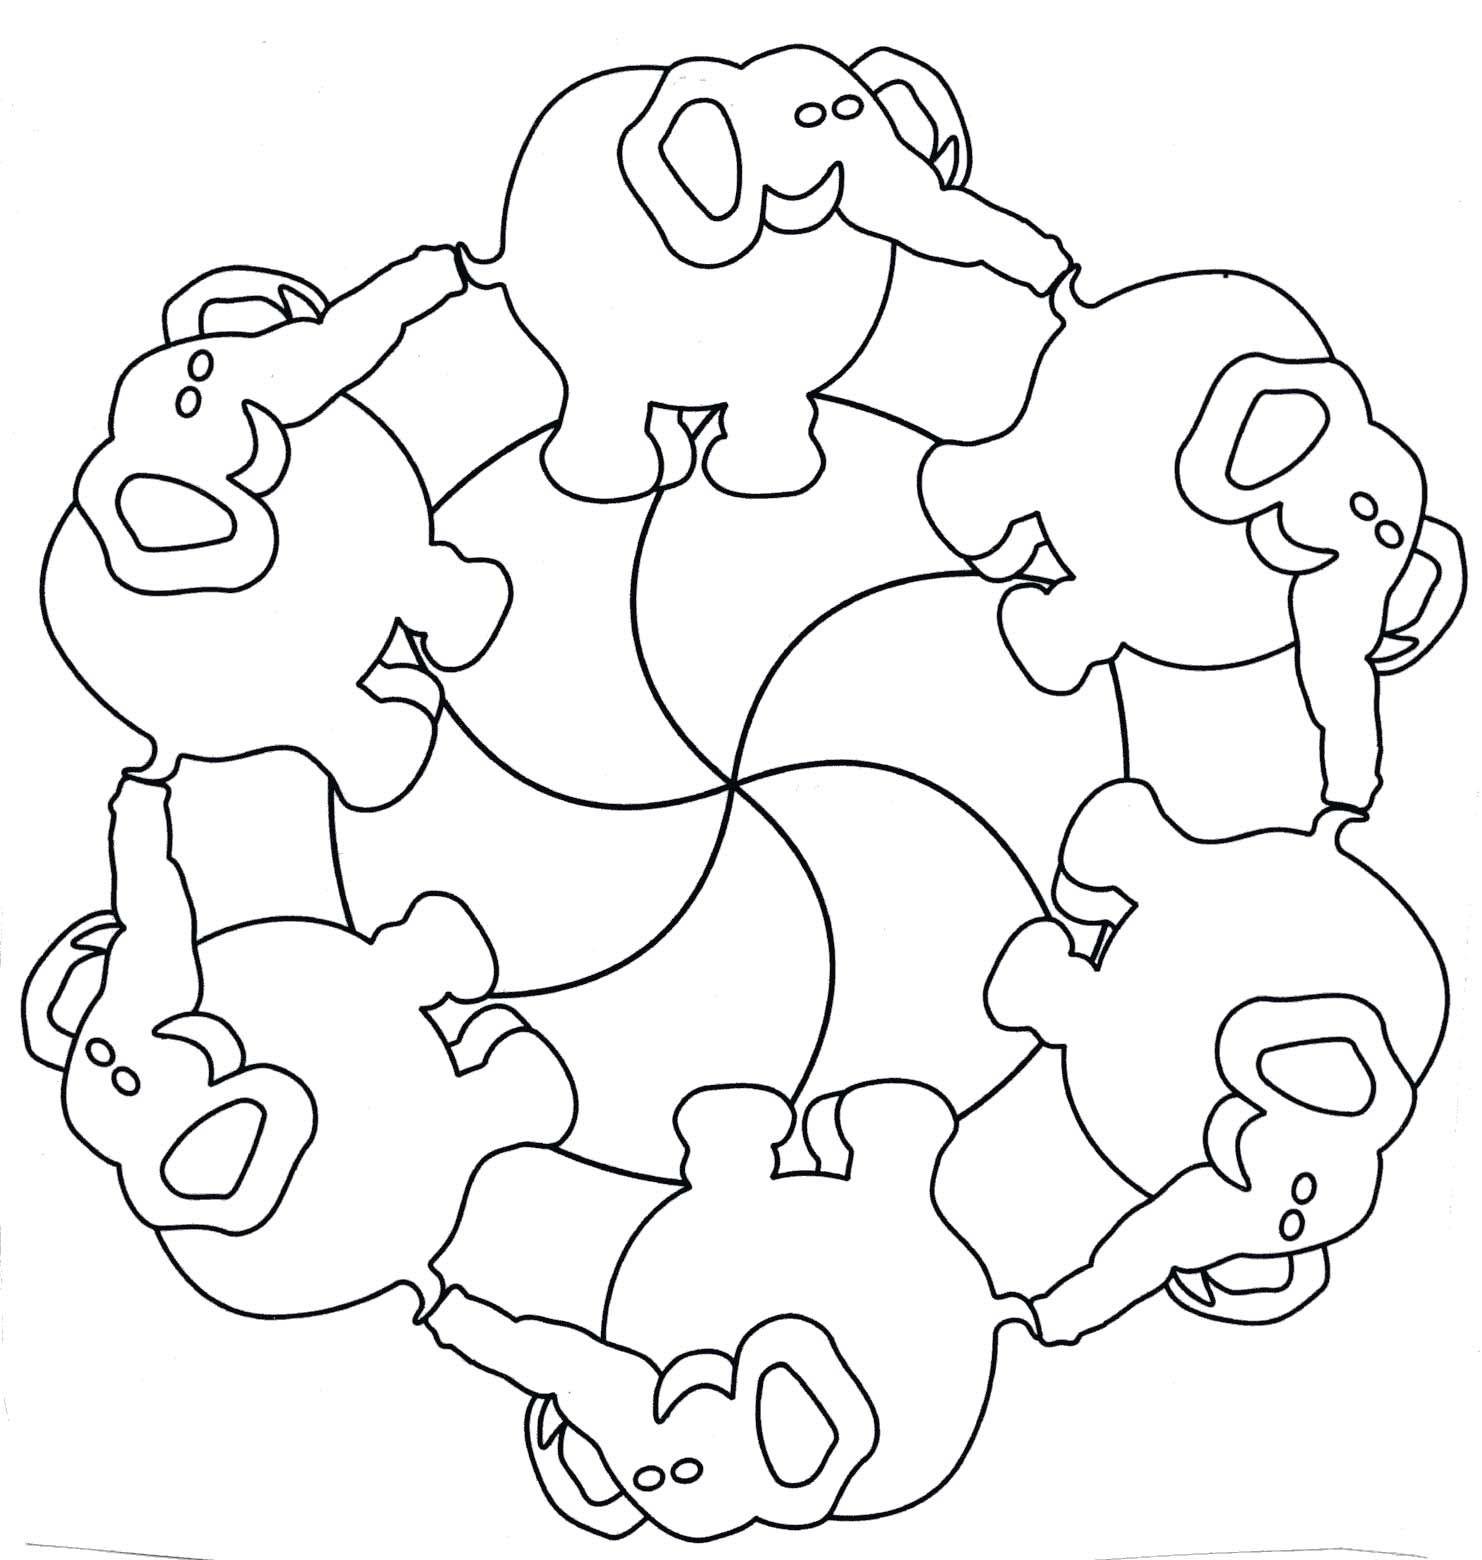 Mandala Kleuetrs Olifant 1 482 1 560 Pixeles